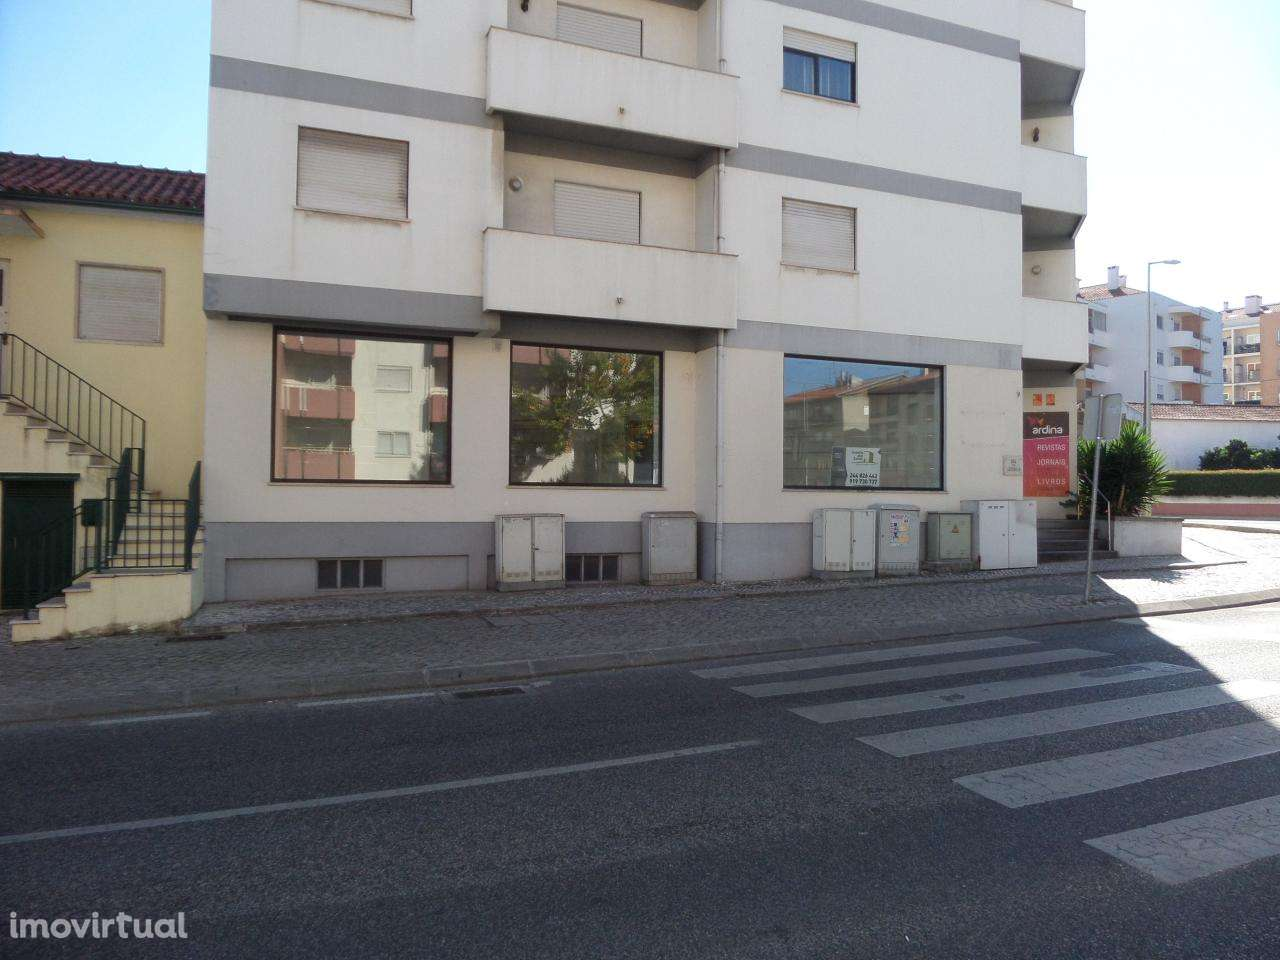 Loja para arrendar, Leiria, Pousos, Barreira e Cortes, Leiria - Foto 12